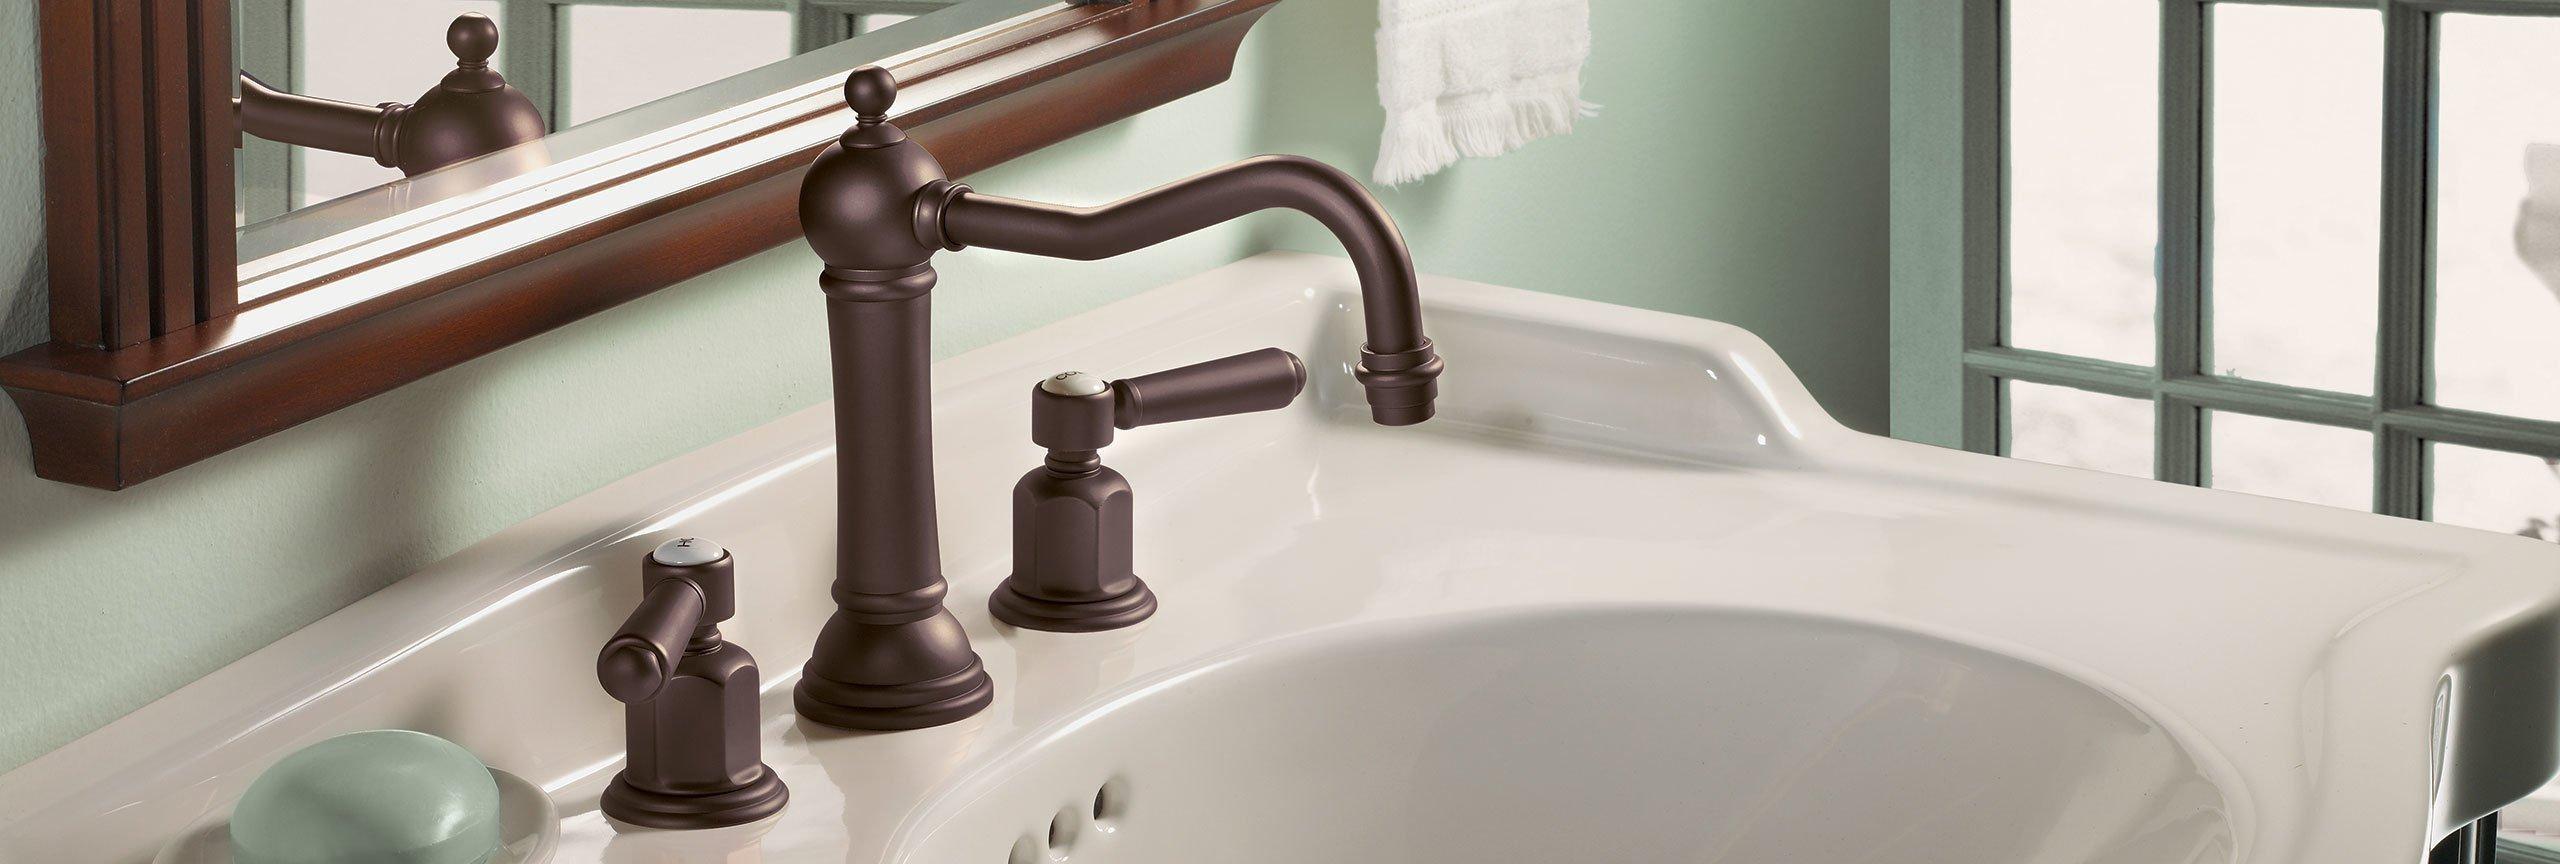 Bathroom series montecito widespread faucet in oil rubbed bronze